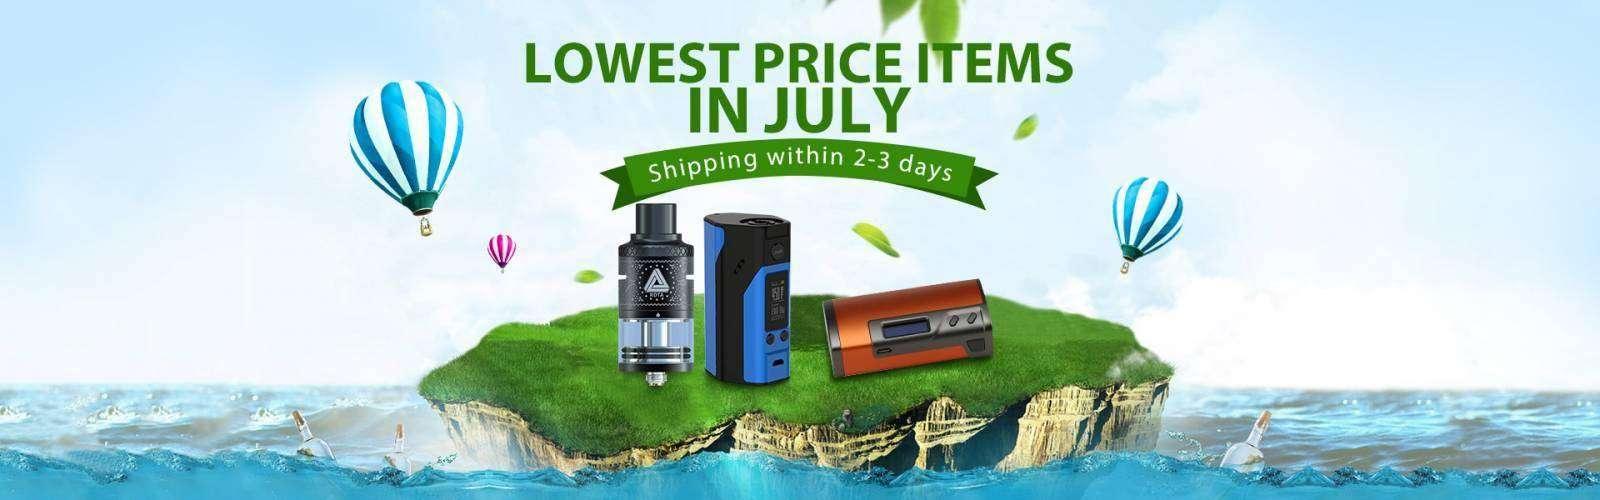 GearBest: Самая низкая цена в ИЮЛЕ для вайперов - отправка за 2-3 дня